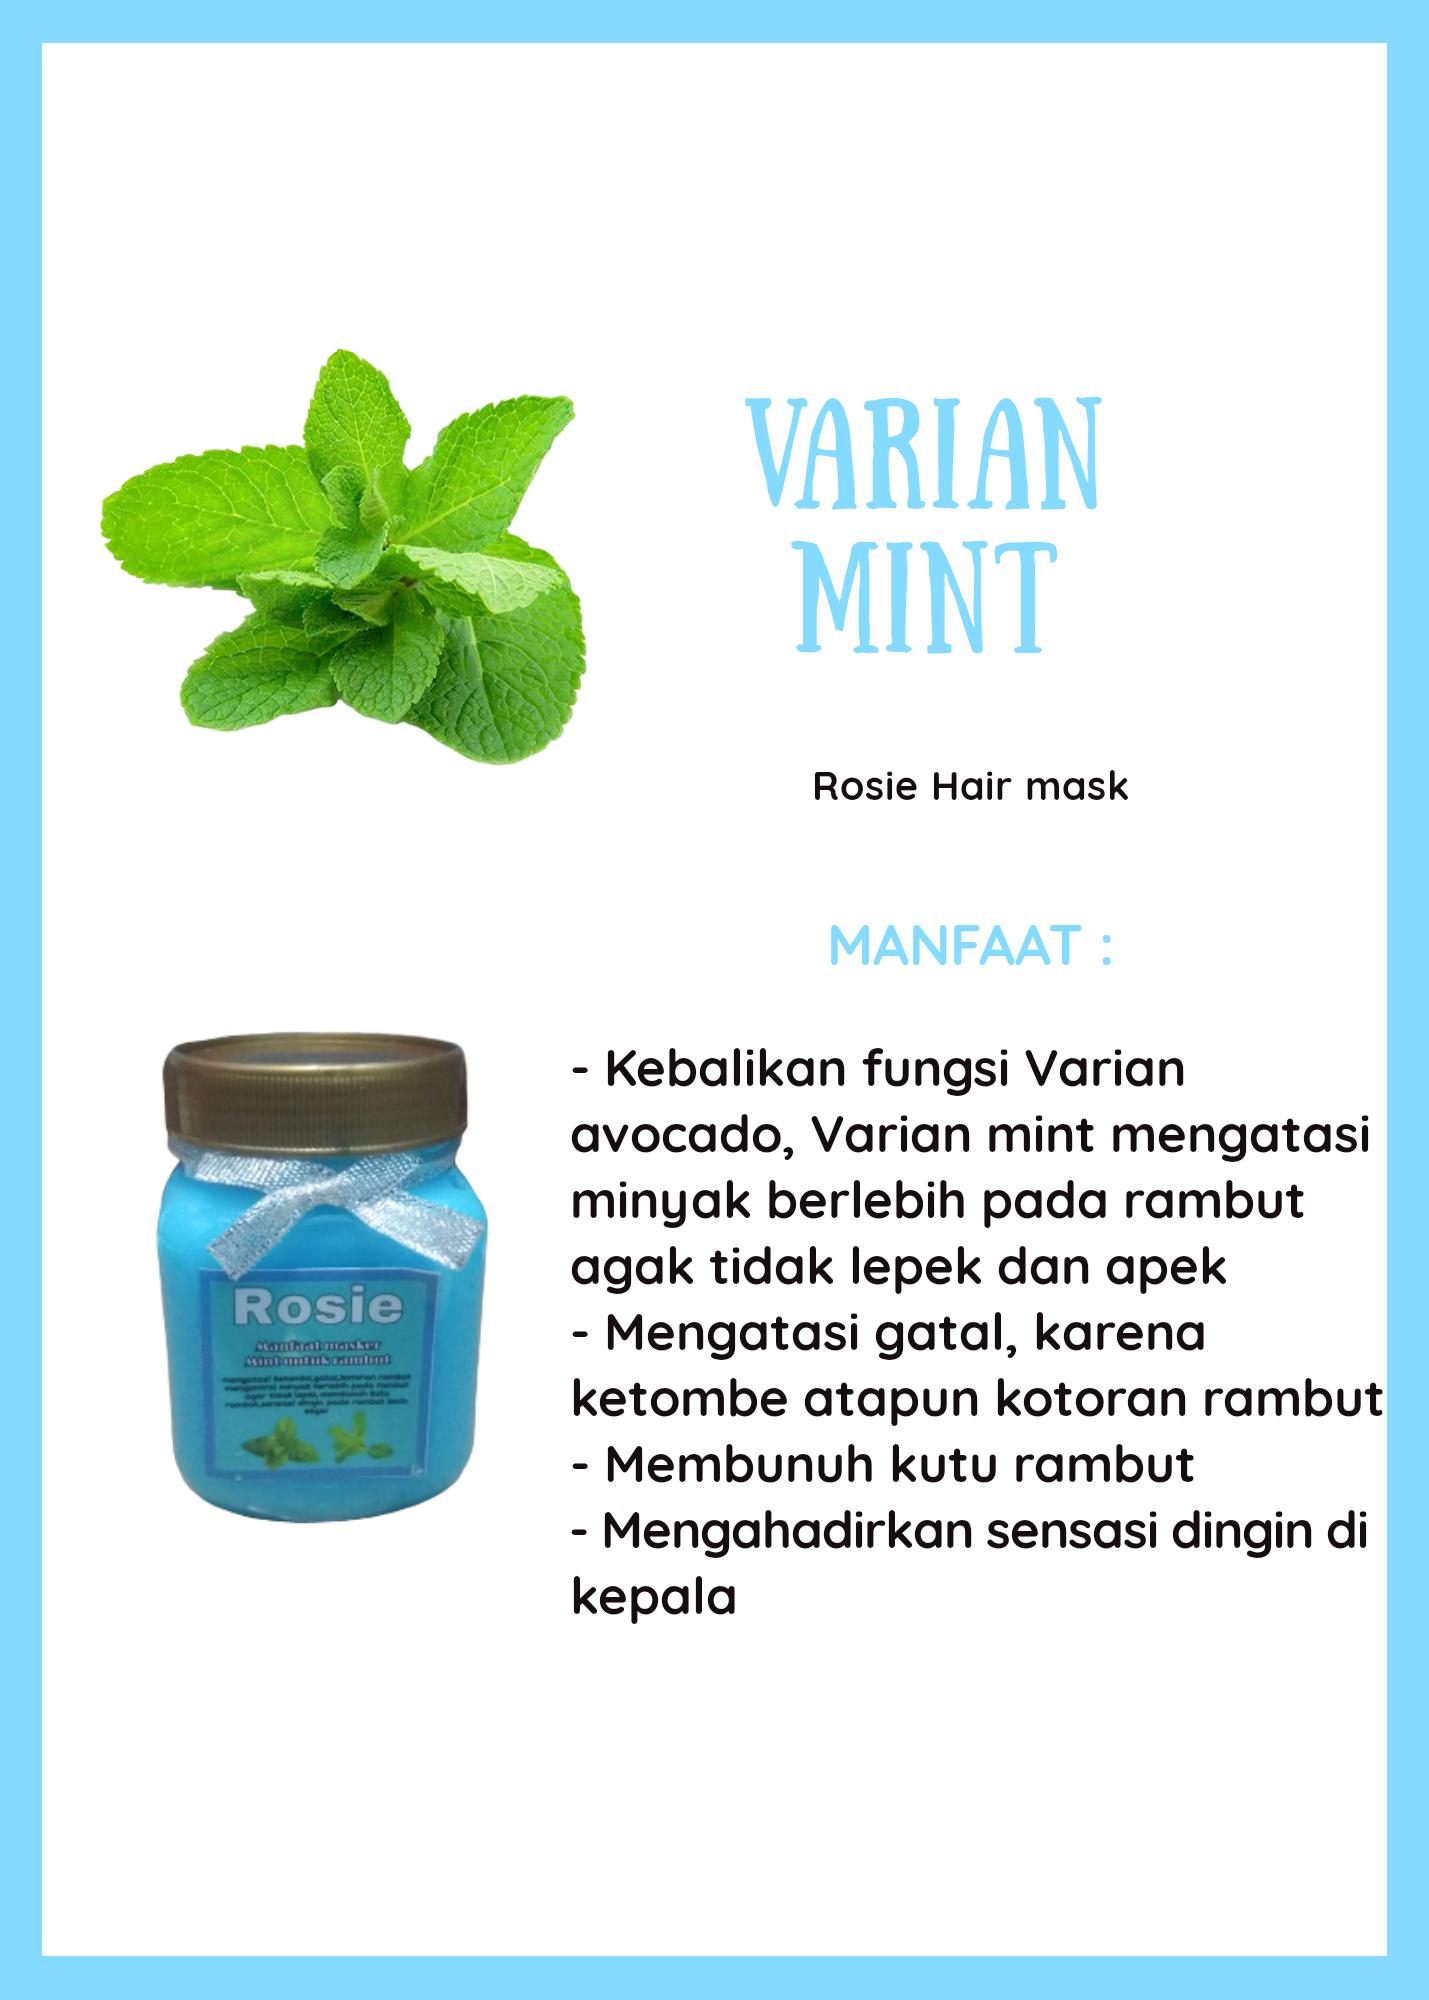 Masker Rambut Hairmask Varian Mint 200ml Lazada Indonesia